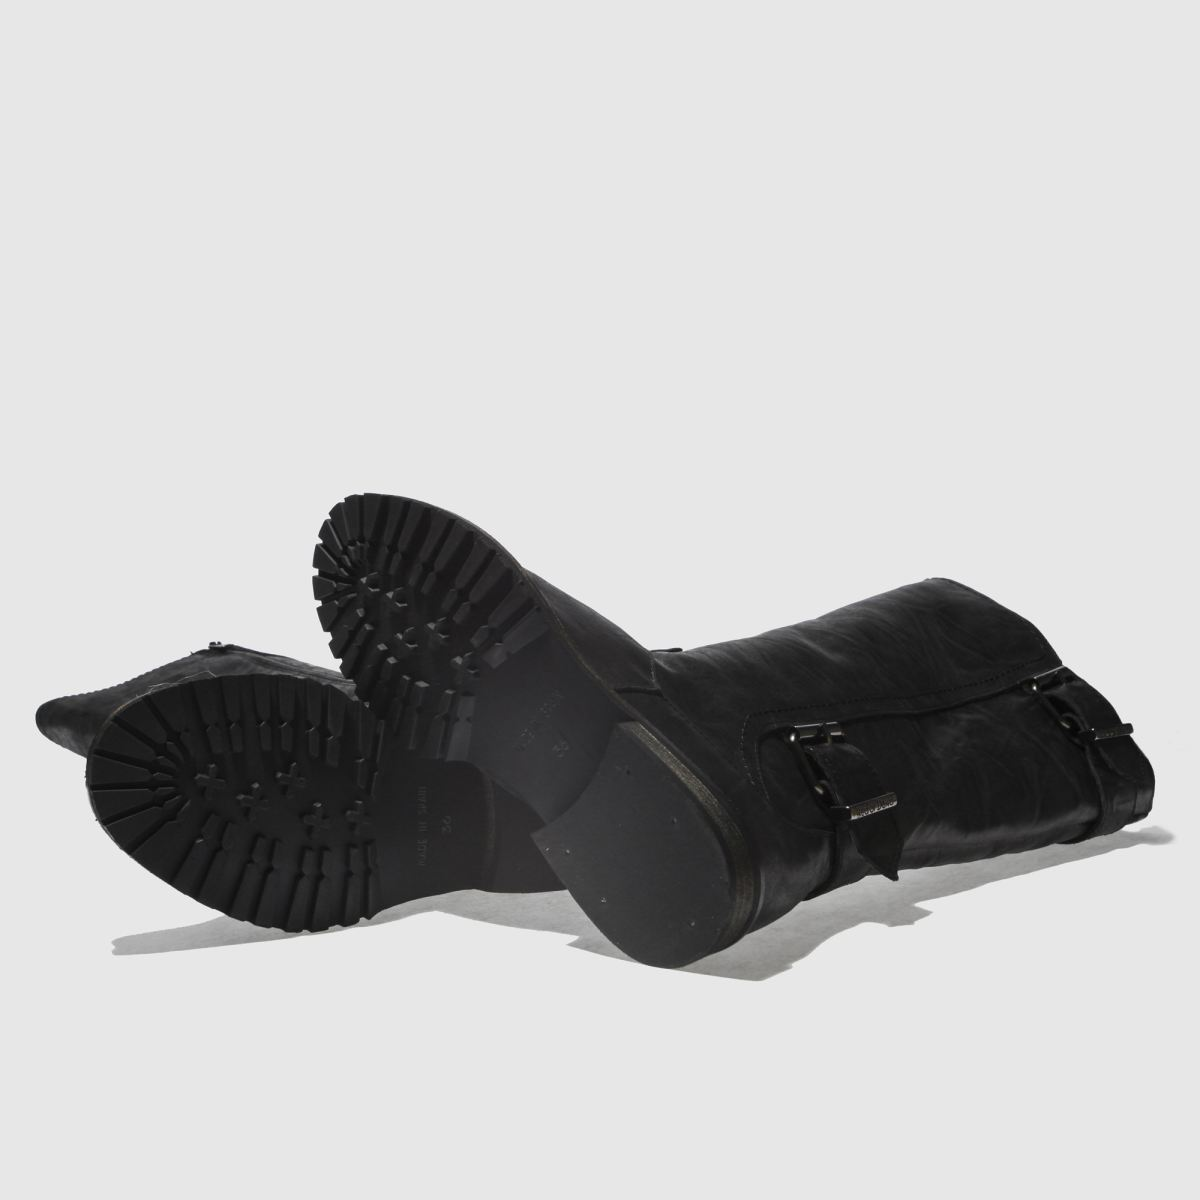 Damen Schwarz Boots red or dead Stop Boots Schwarz | schuh Gute Qualität beliebte Schuhe ba1678